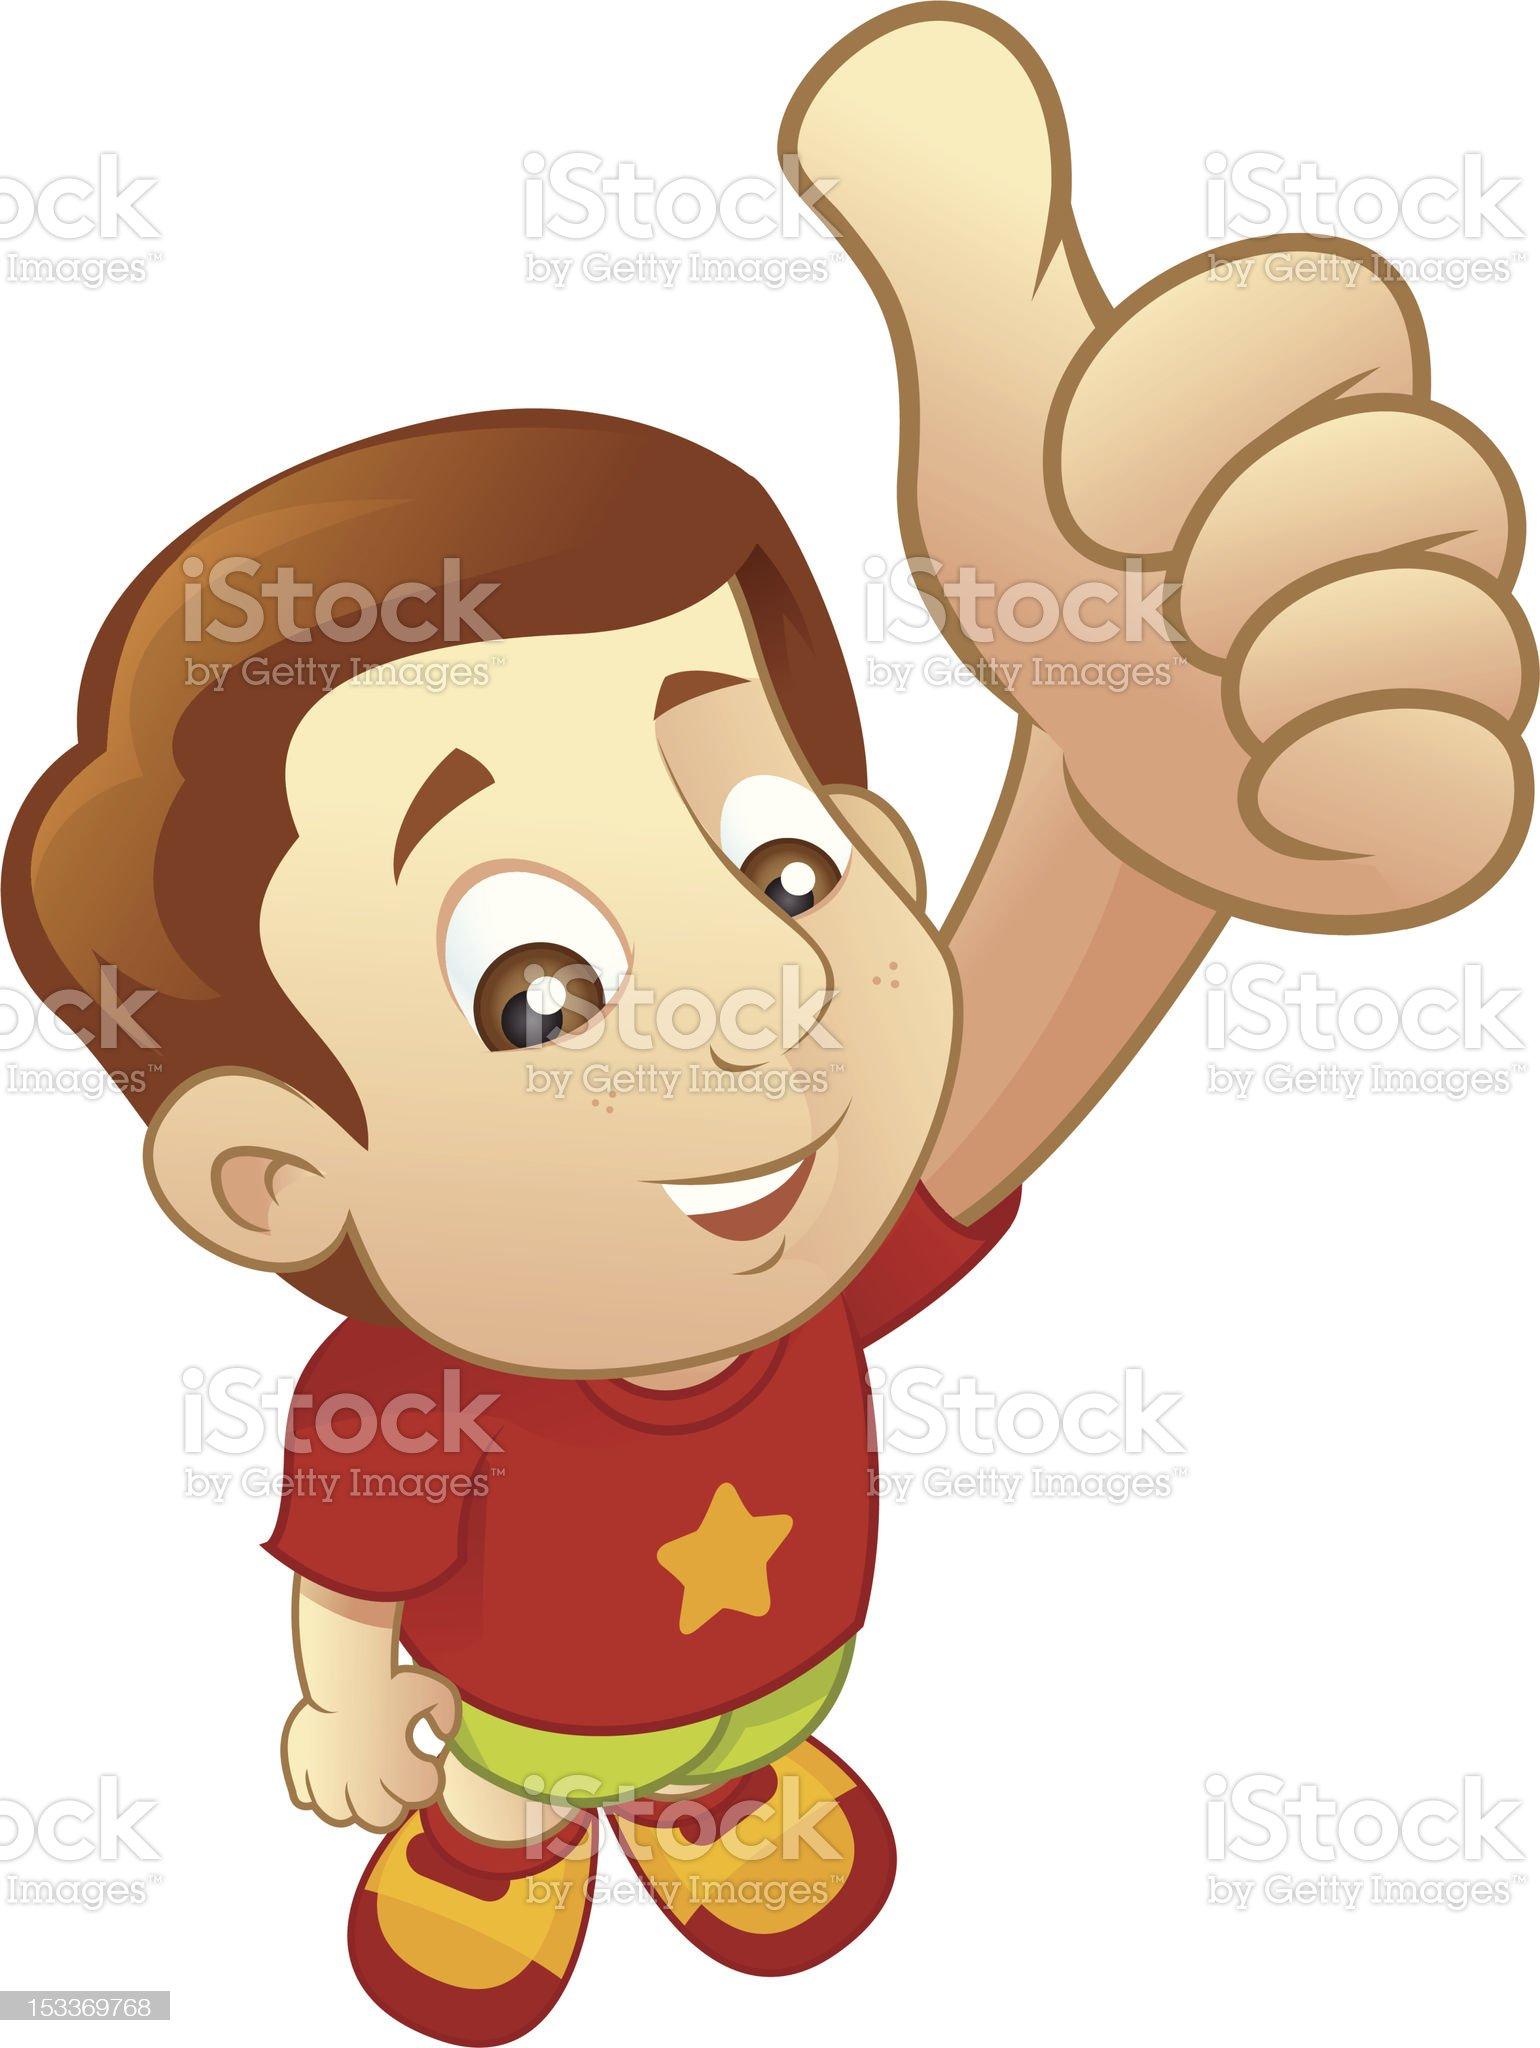 Kid - thumb up royalty-free stock vector art